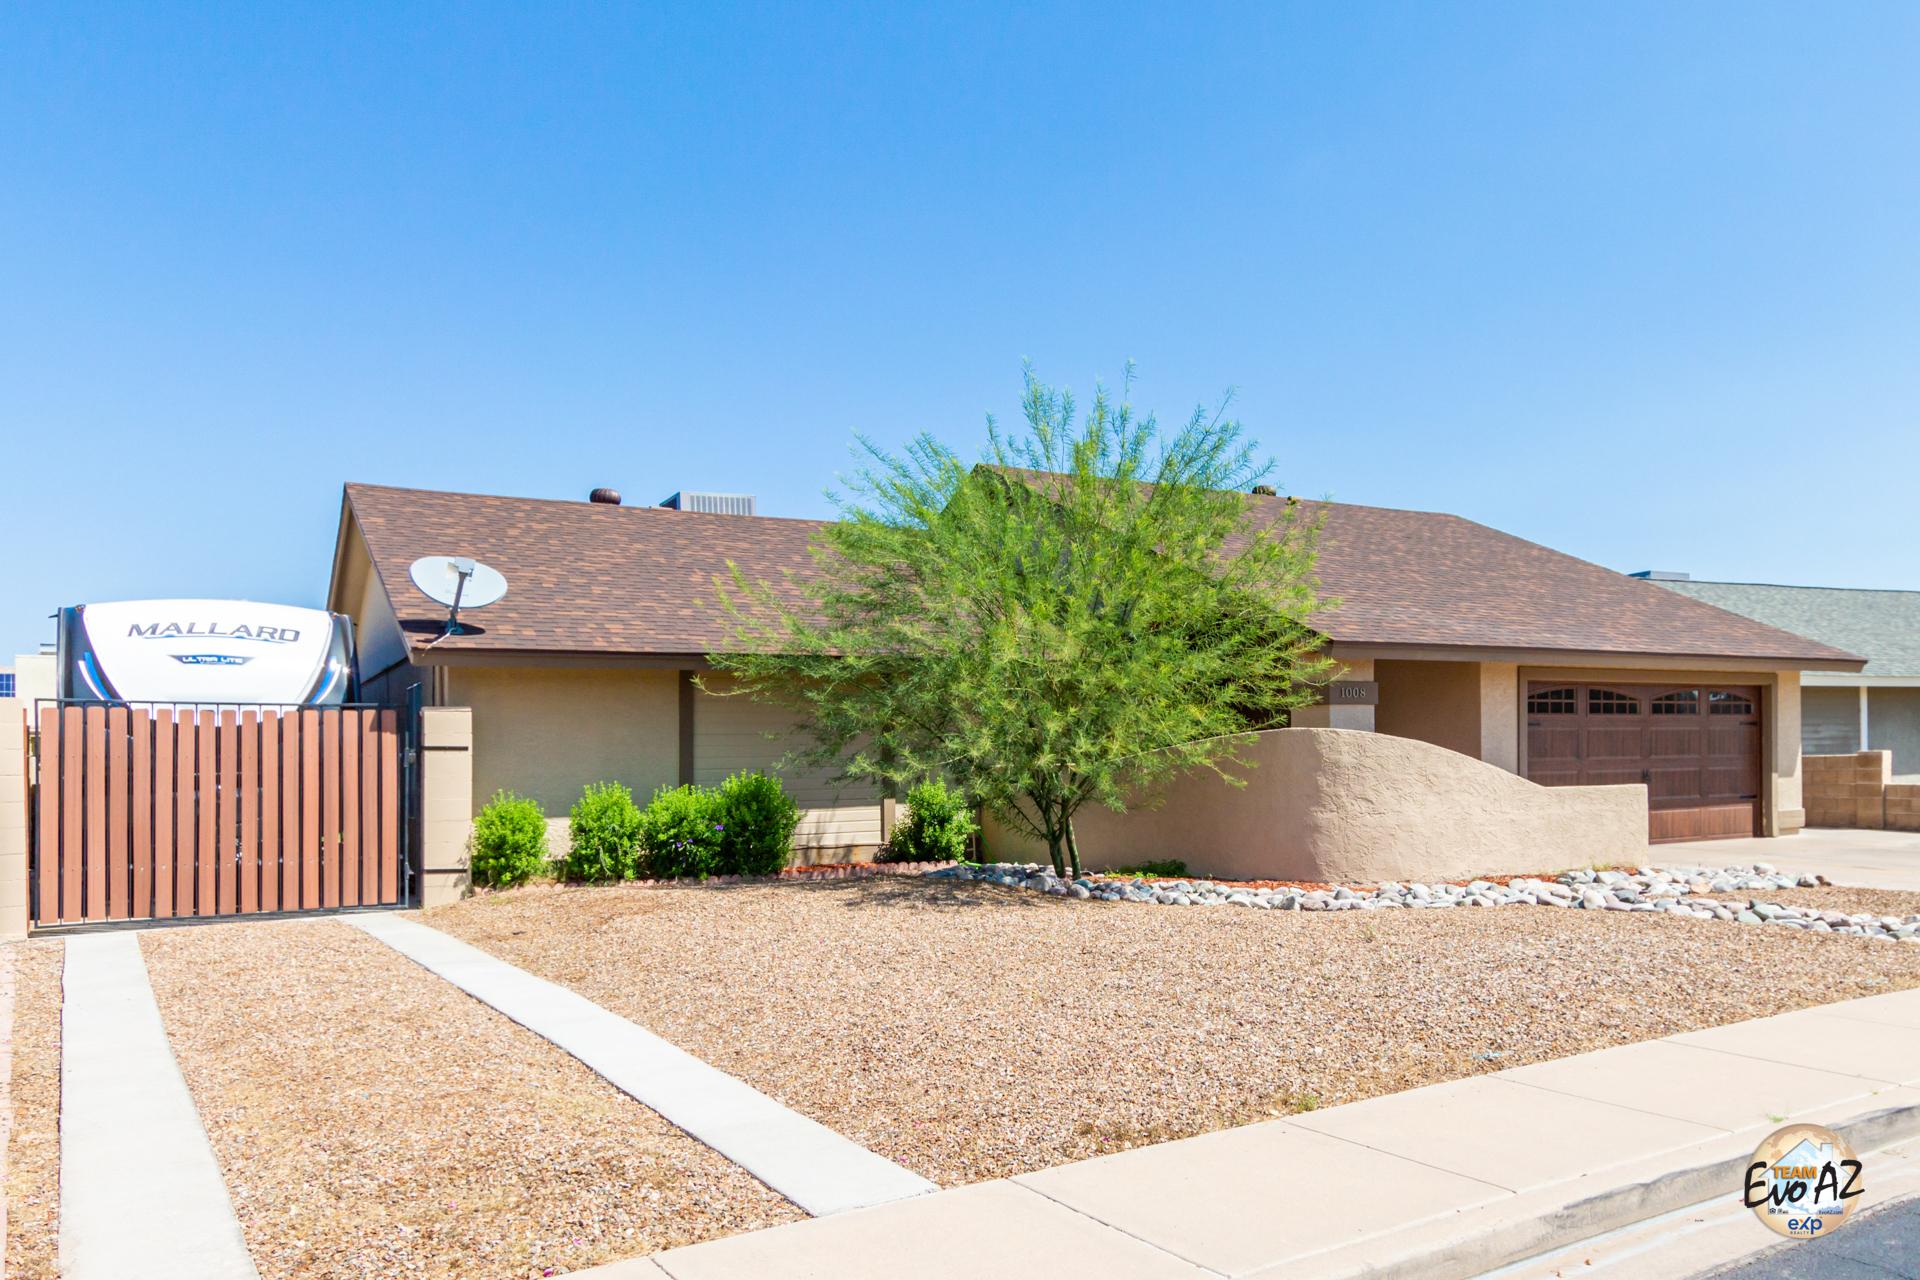 1008 E INGRAM ST, Mesa, AZ 85203